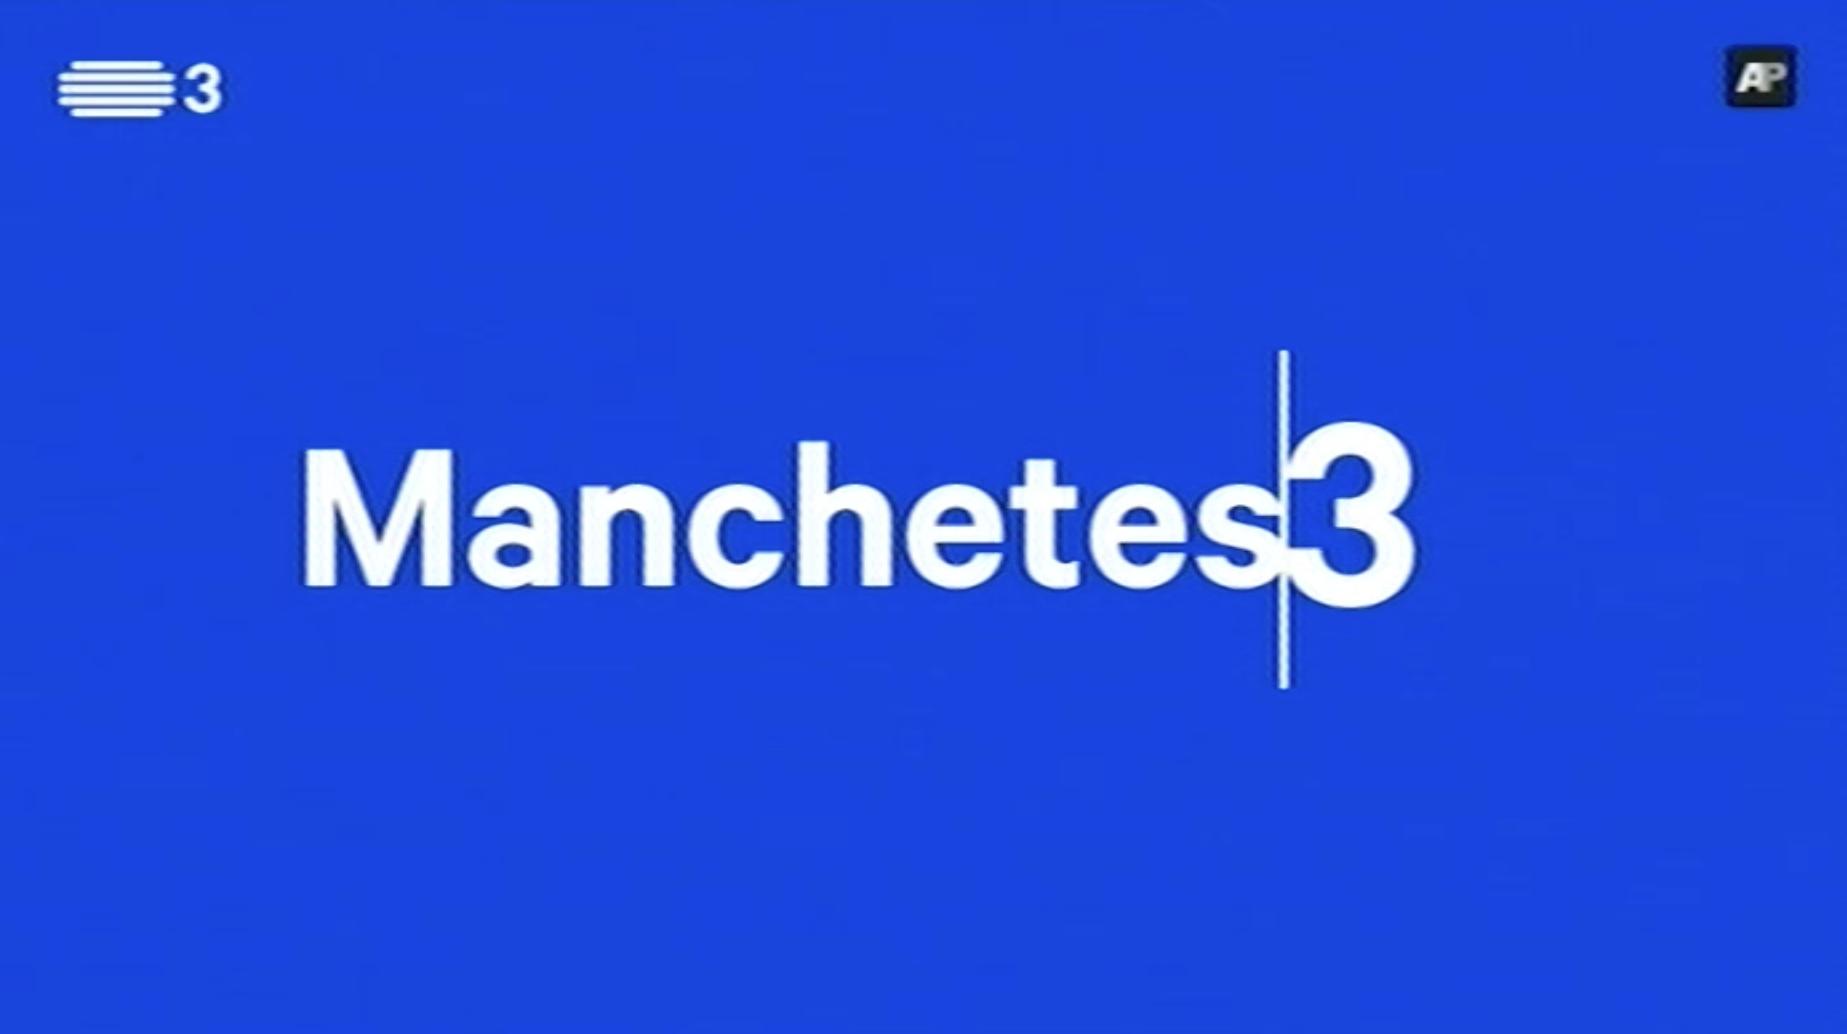 Manchetes 3 - Temporada